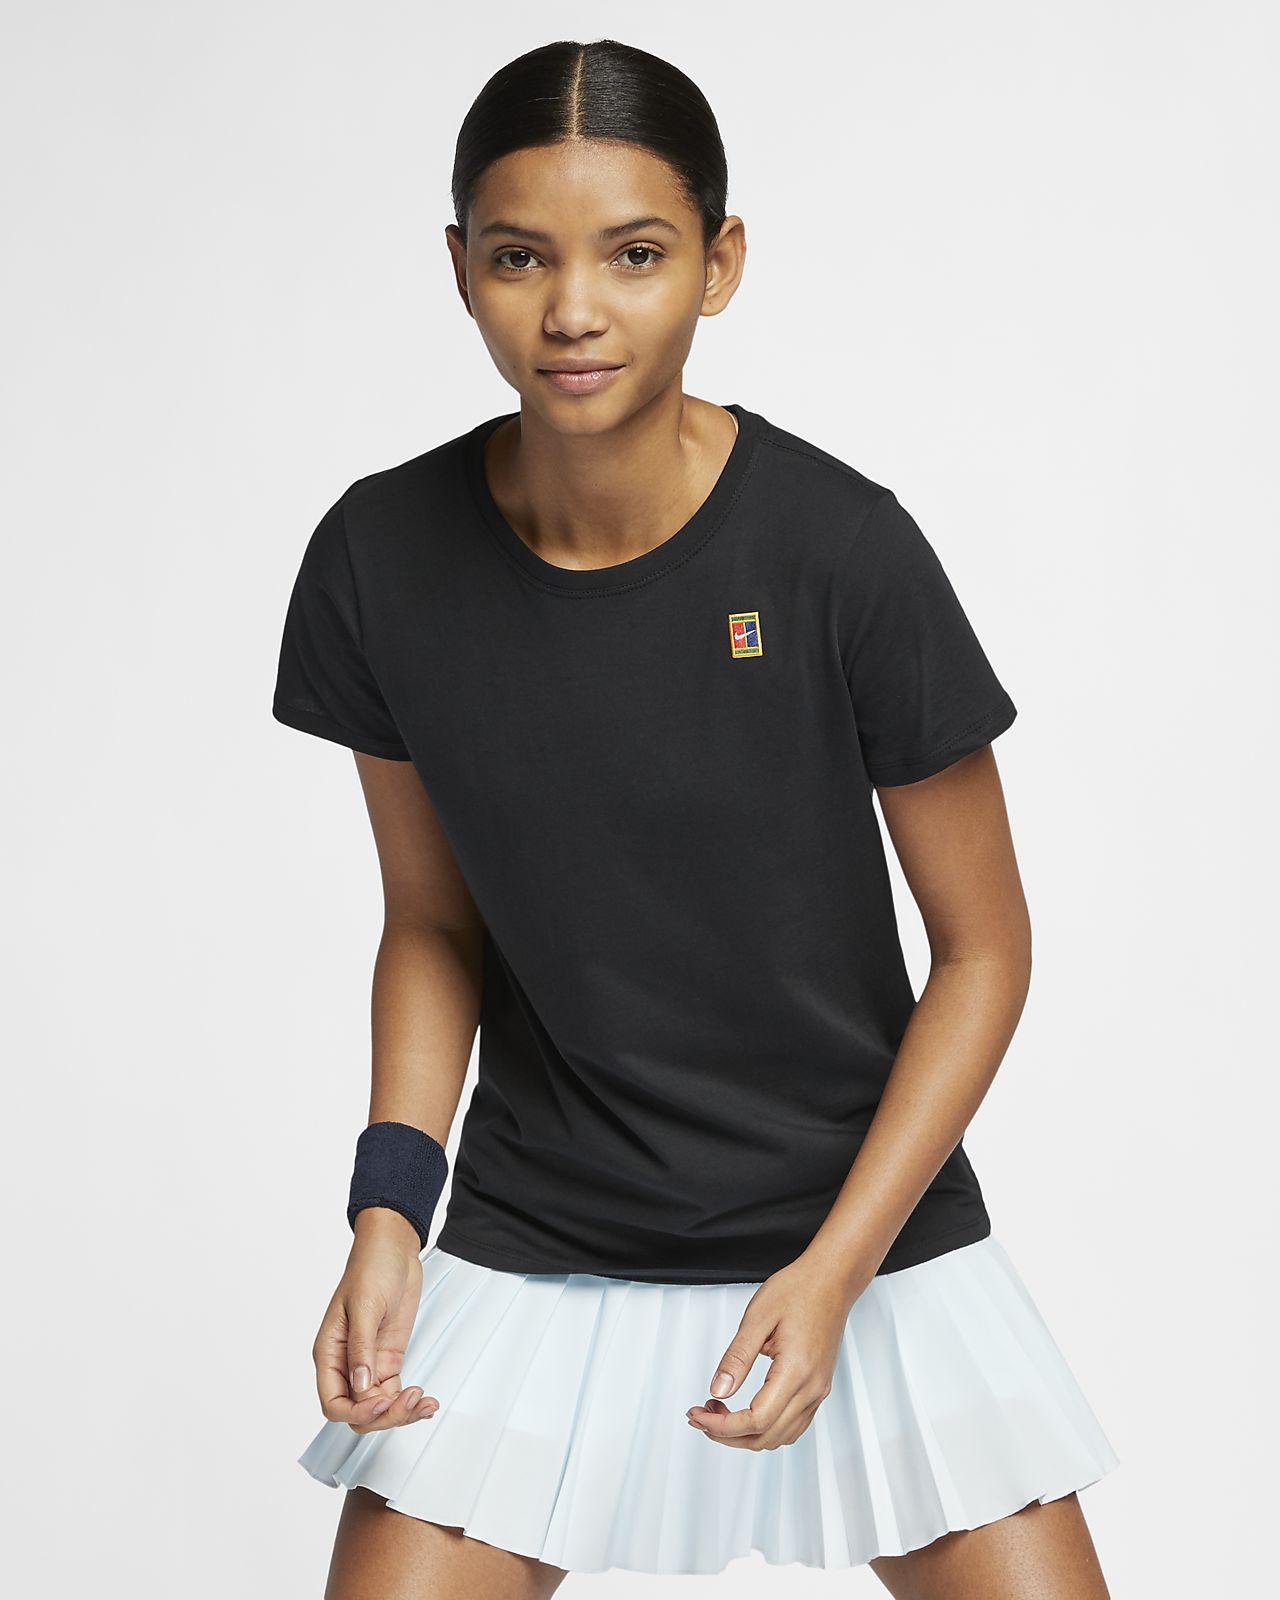 new arrival 47761 d1199 ... NikeCourt-tennis-T-shirt til kvinder